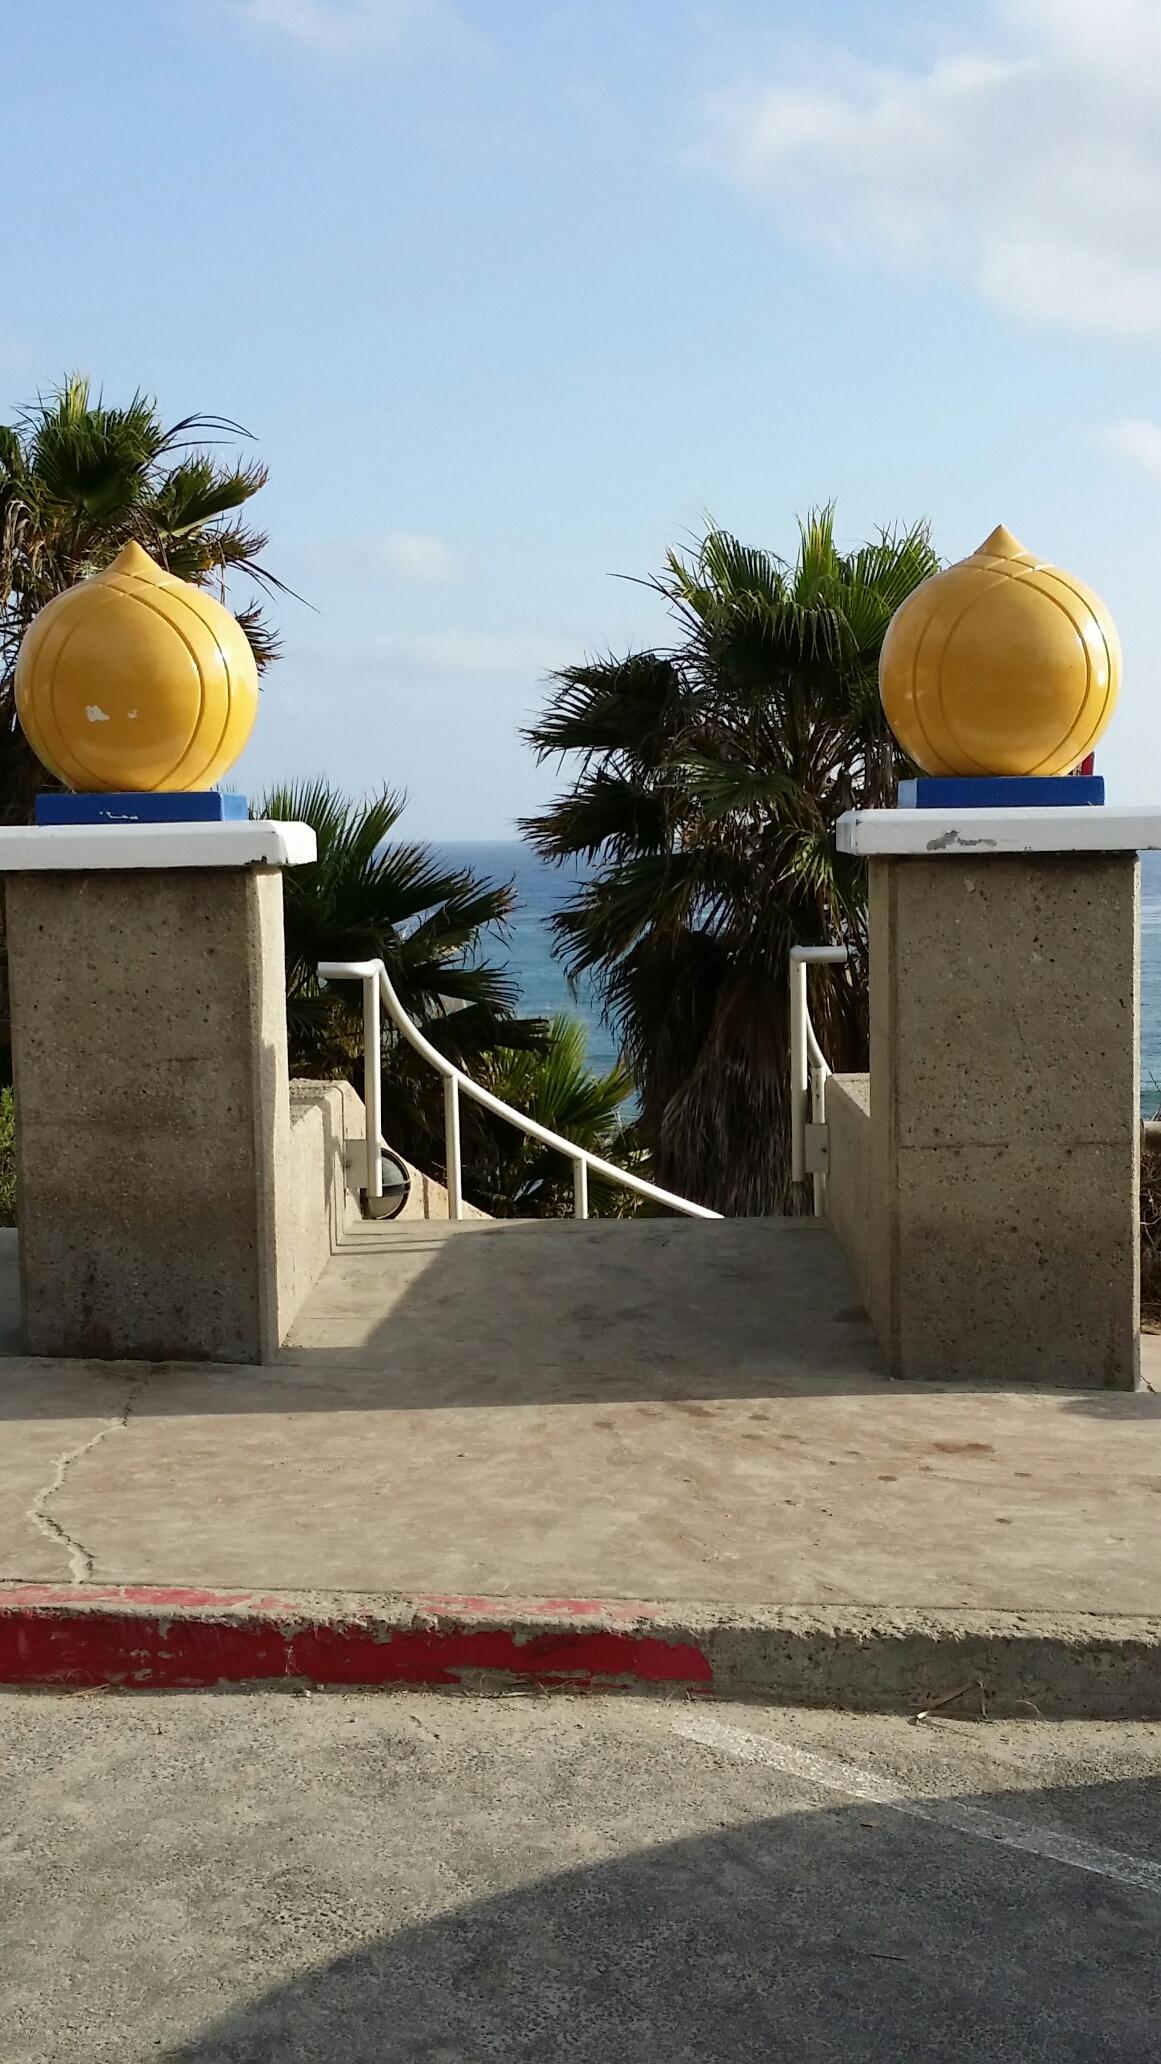 Swami's Beach, Encinitas